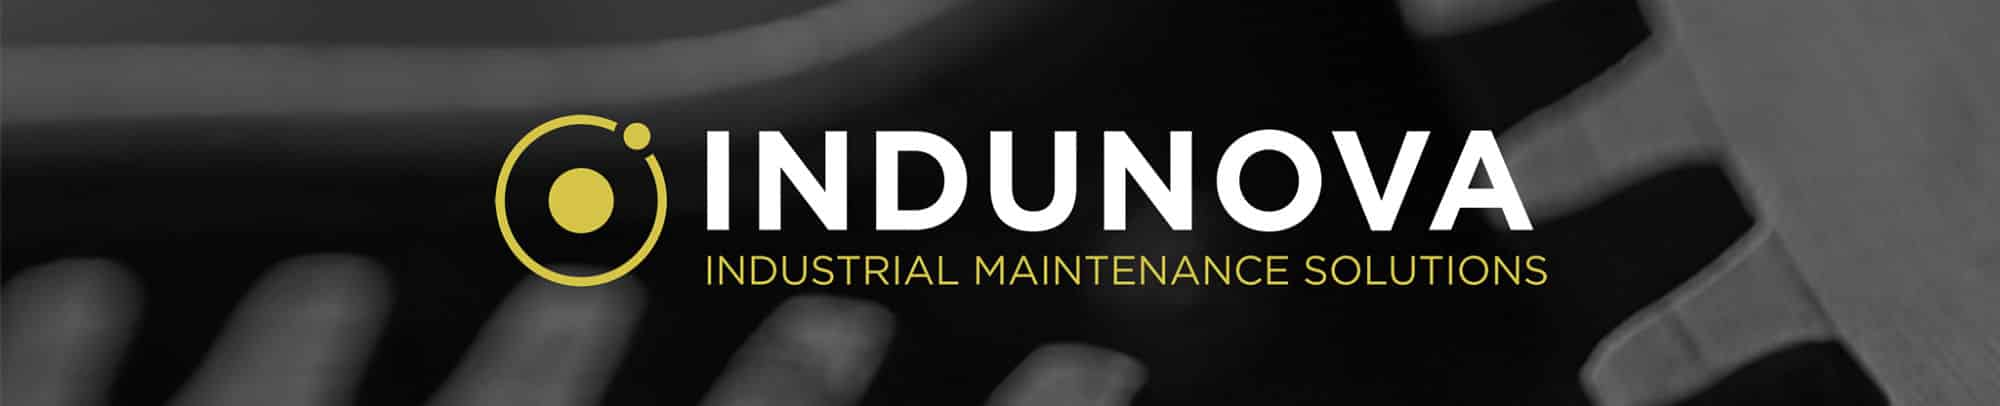 Indunova - Aplicaciones de Limpieza criogénica